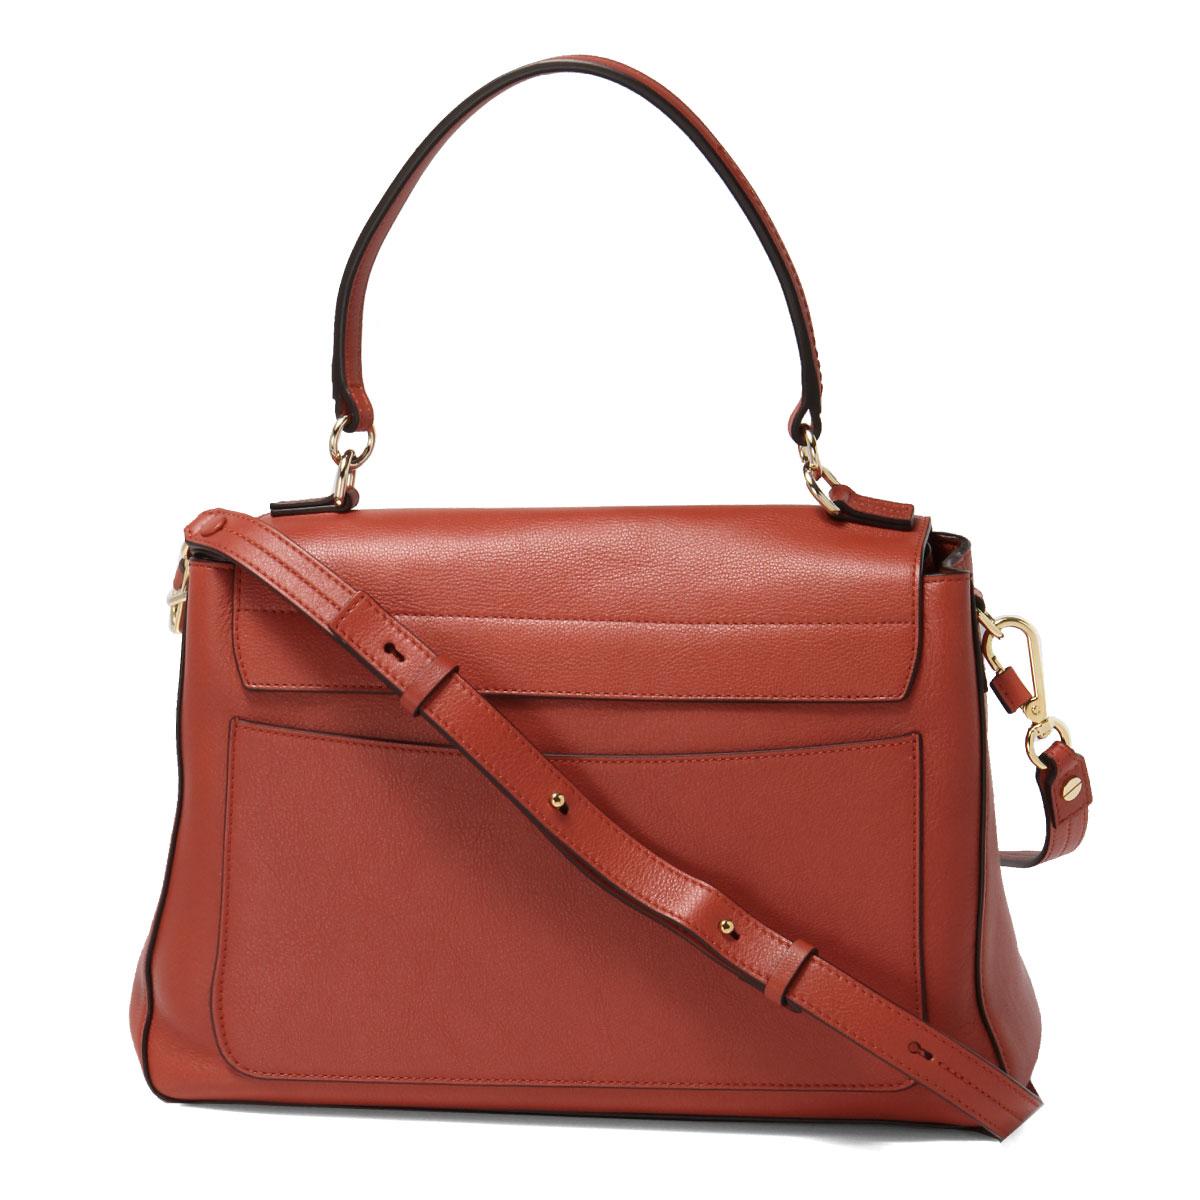 8e6c0a6f7c8c importshopdouble  Kuroe CHLOE bag lady C17WS321 HGJ 647 shoulder ...